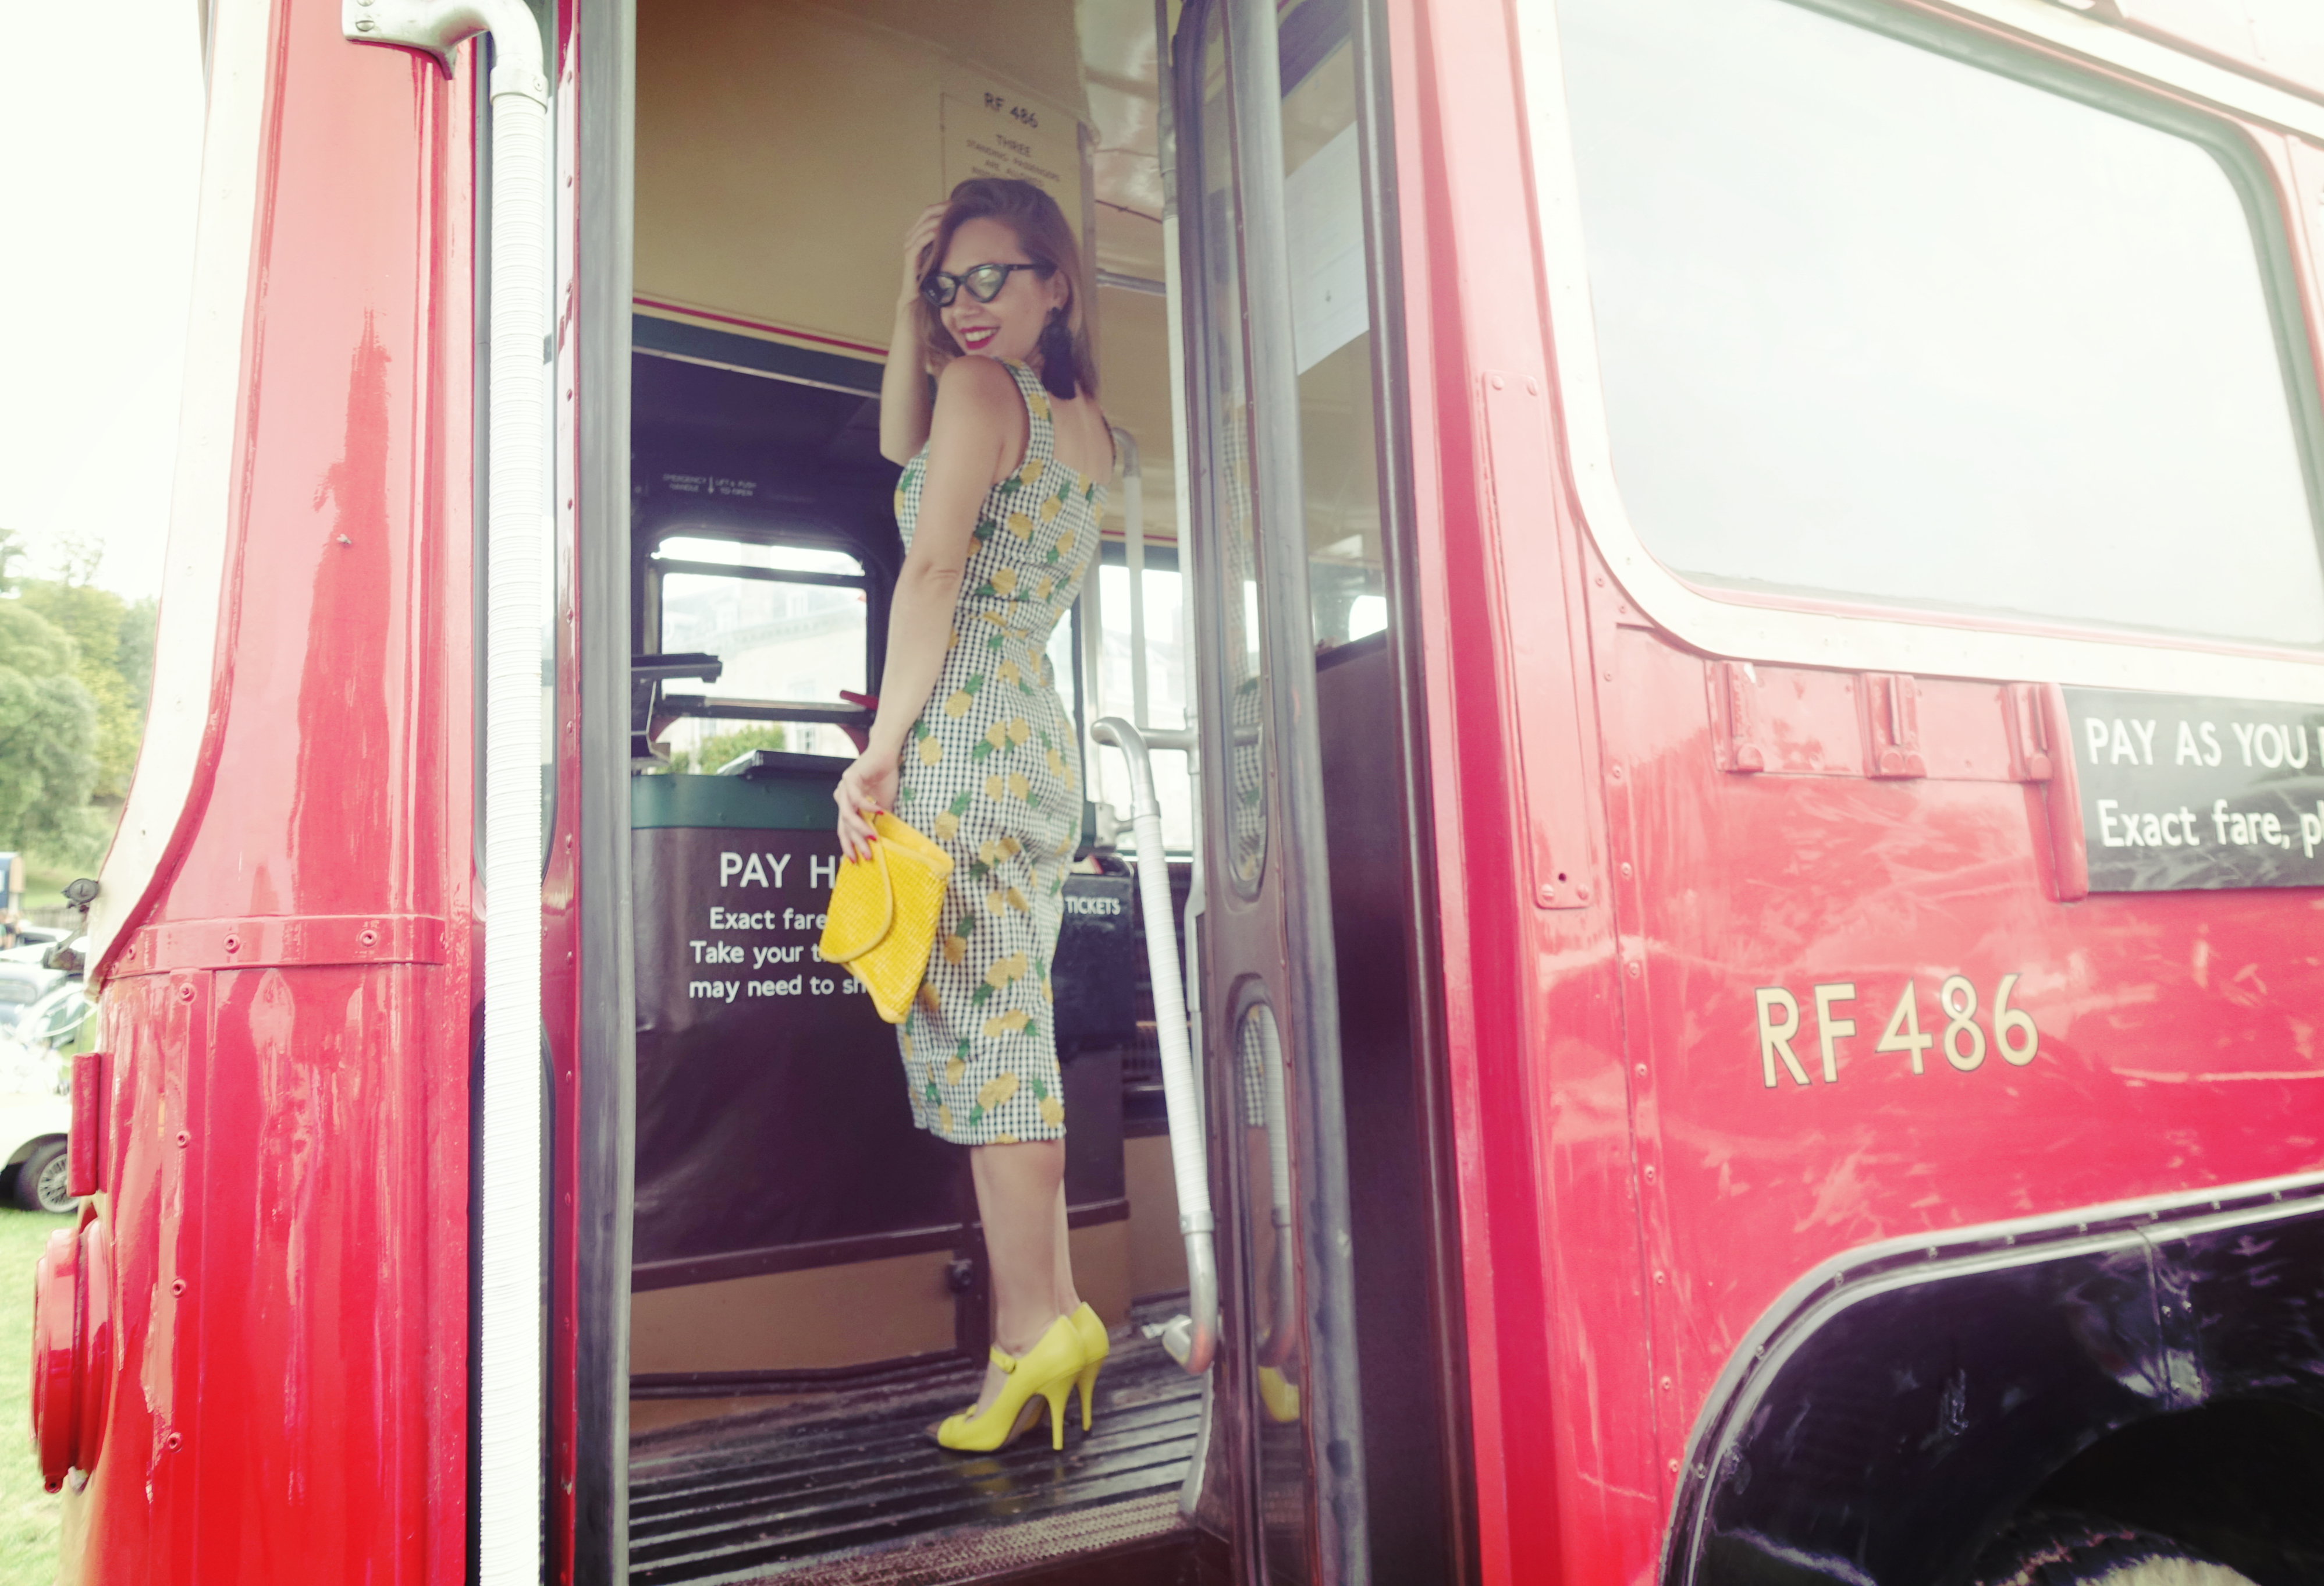 london-to-brighton-PiensaenChic-blog-de-moda-Chicadicta-fashionista-collectif-dress-Chic-adicta-influencer-Piensa-en-Chic